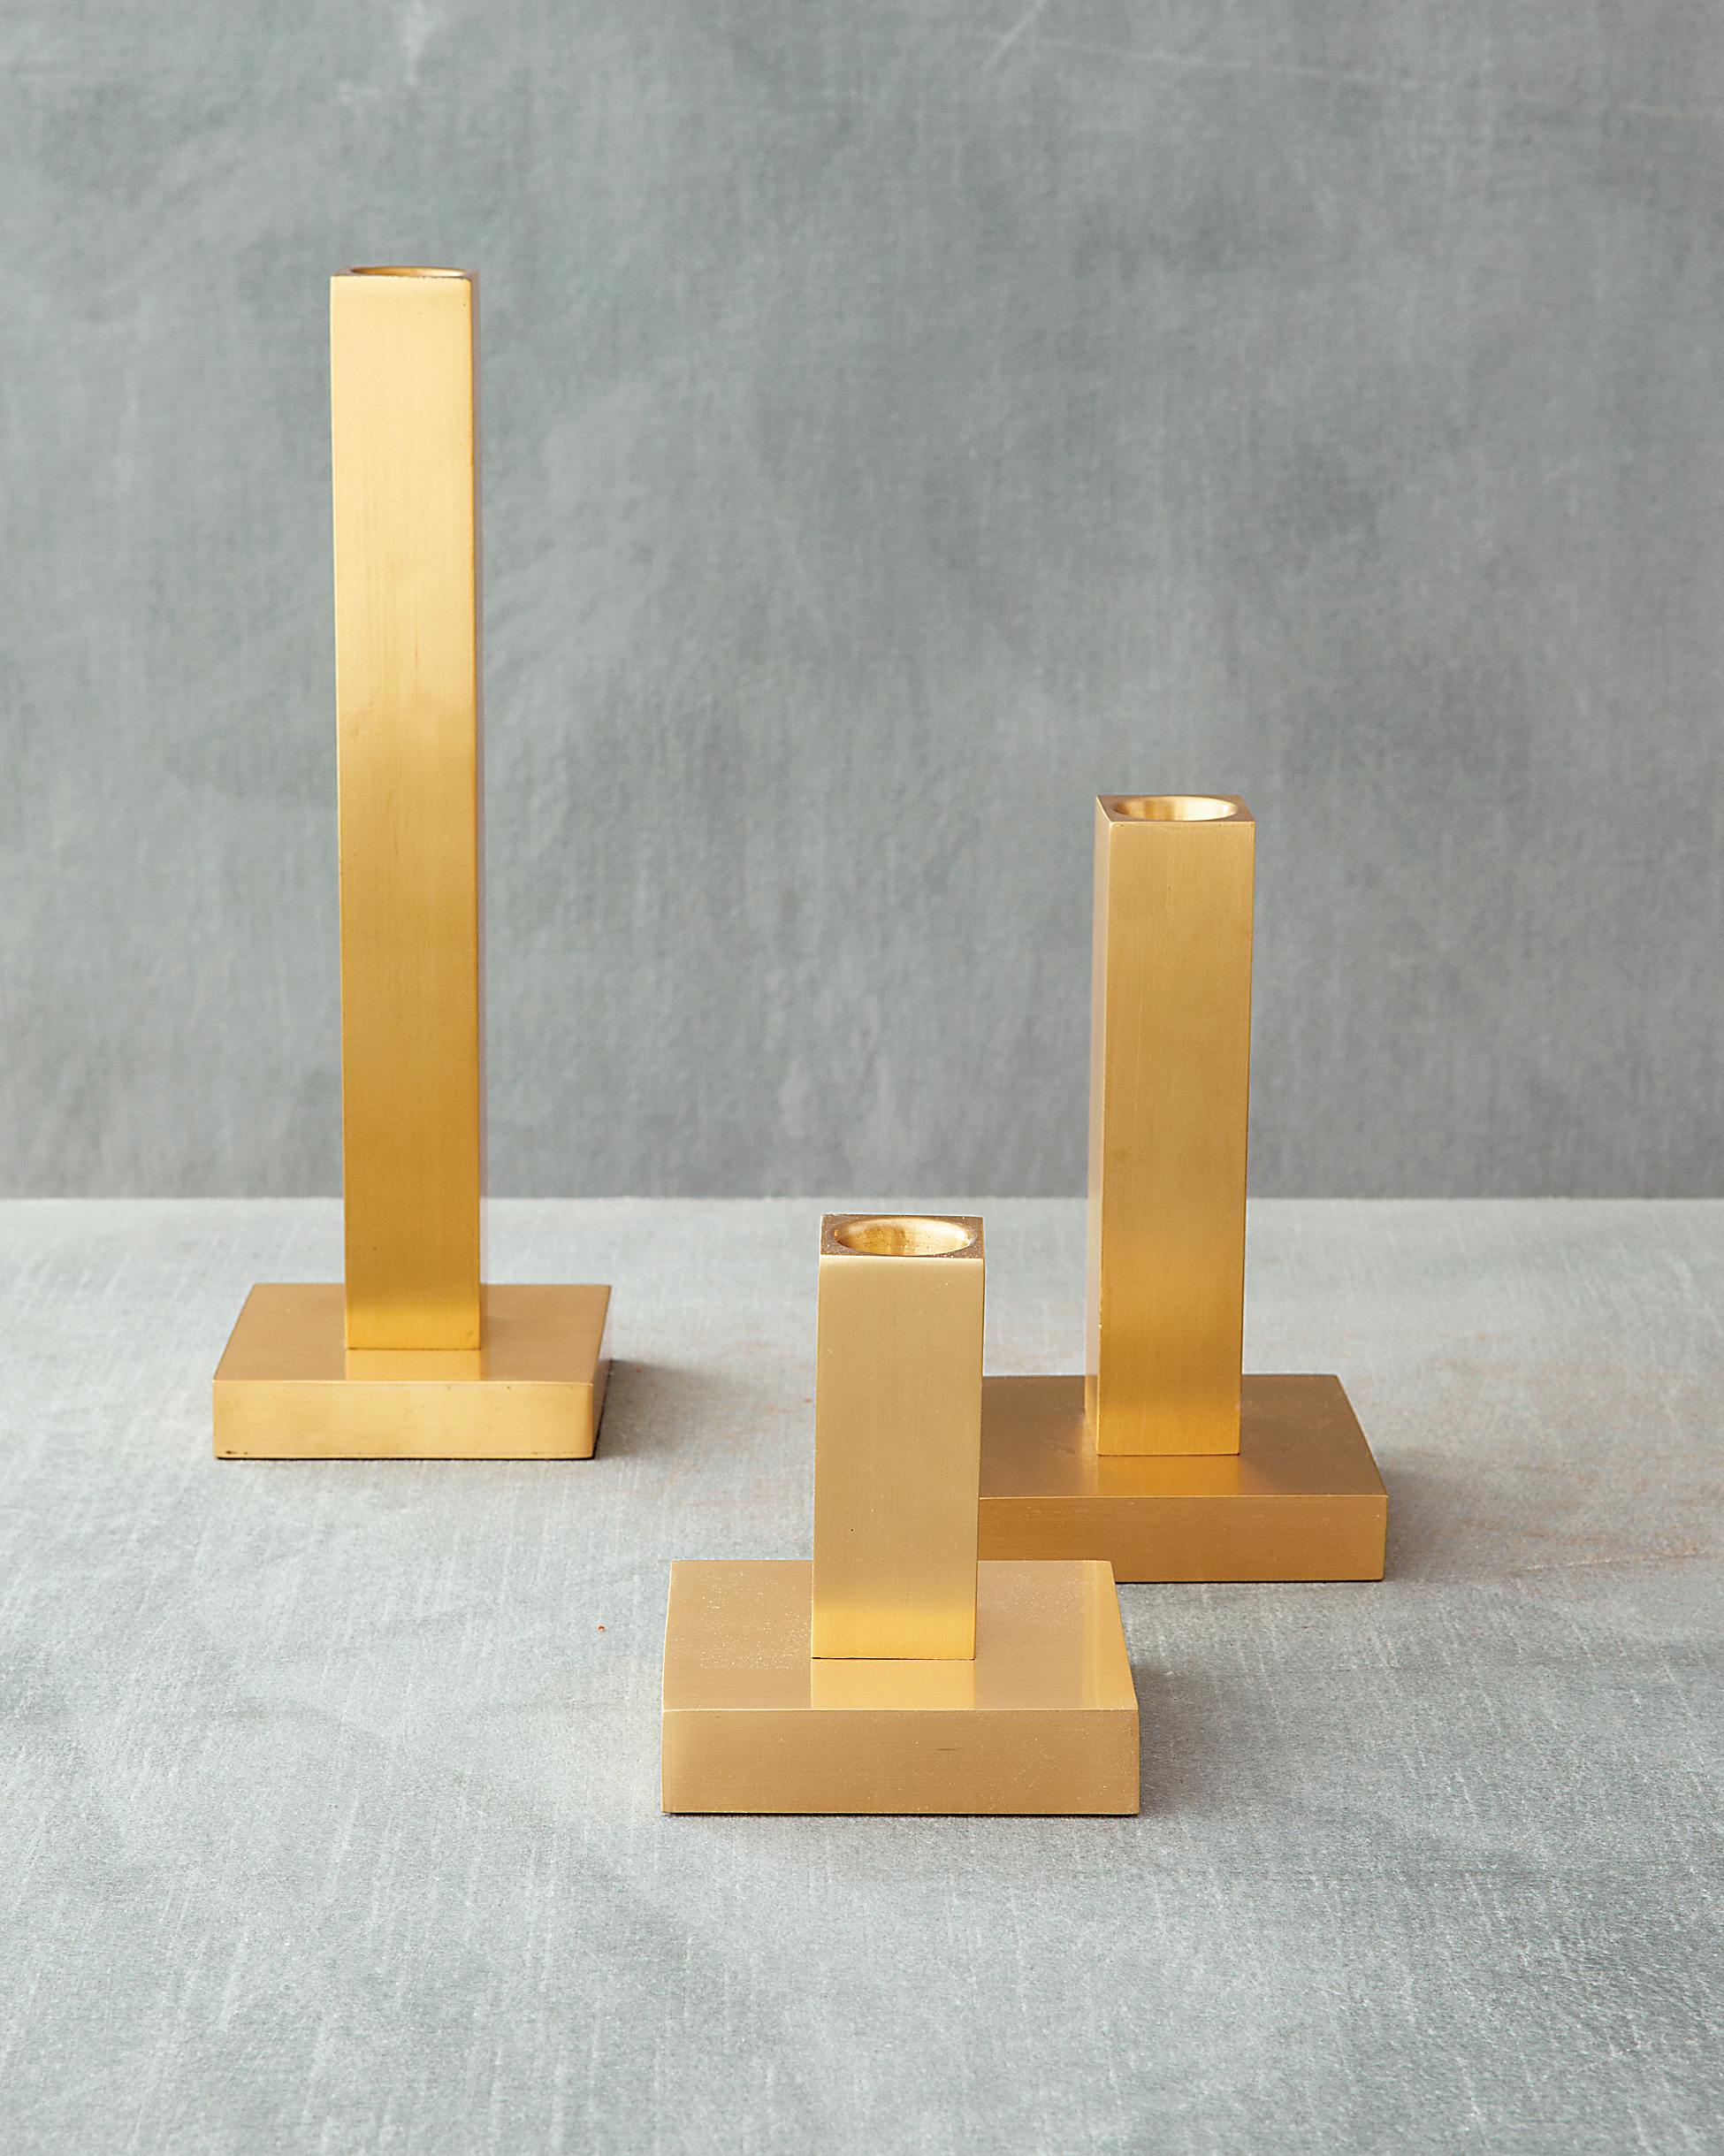 candlesticks-0811mwd107434.jpg